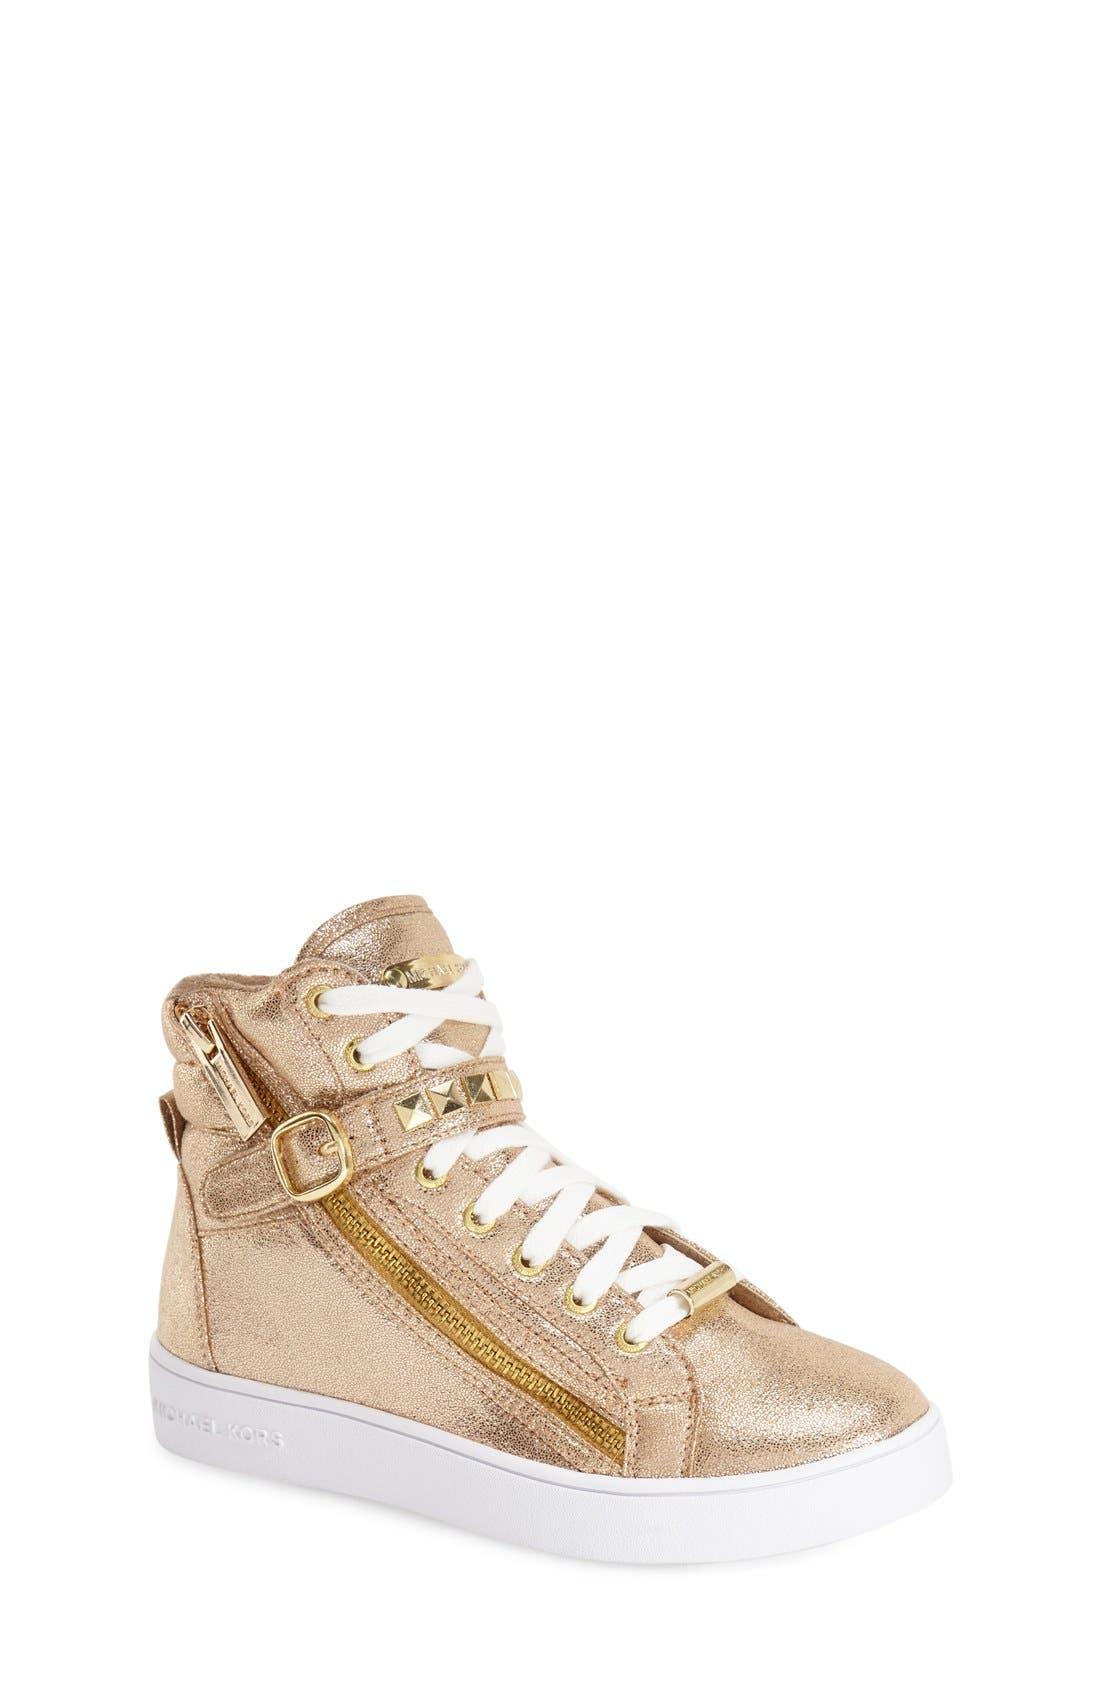 MICHAEL MICHAEL KORS Ivy Rory High Top Sneaker